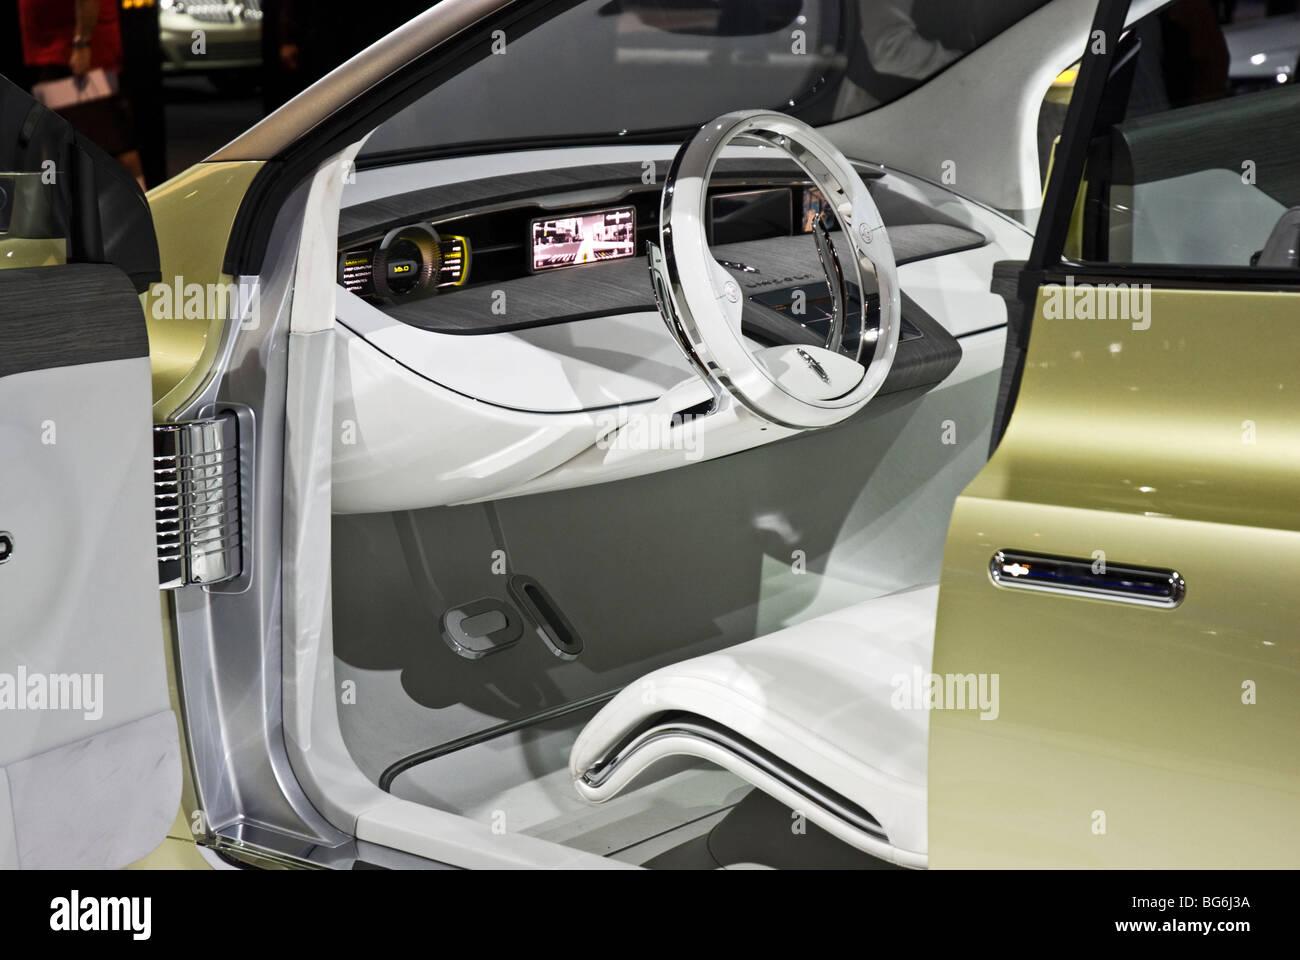 http://c8.alamy.com/comp/BG6J3A/the-lincoln-c-concept-car-at-the-2009-la-auto-show-in-the-los-angeles-BG6J3A.jpg